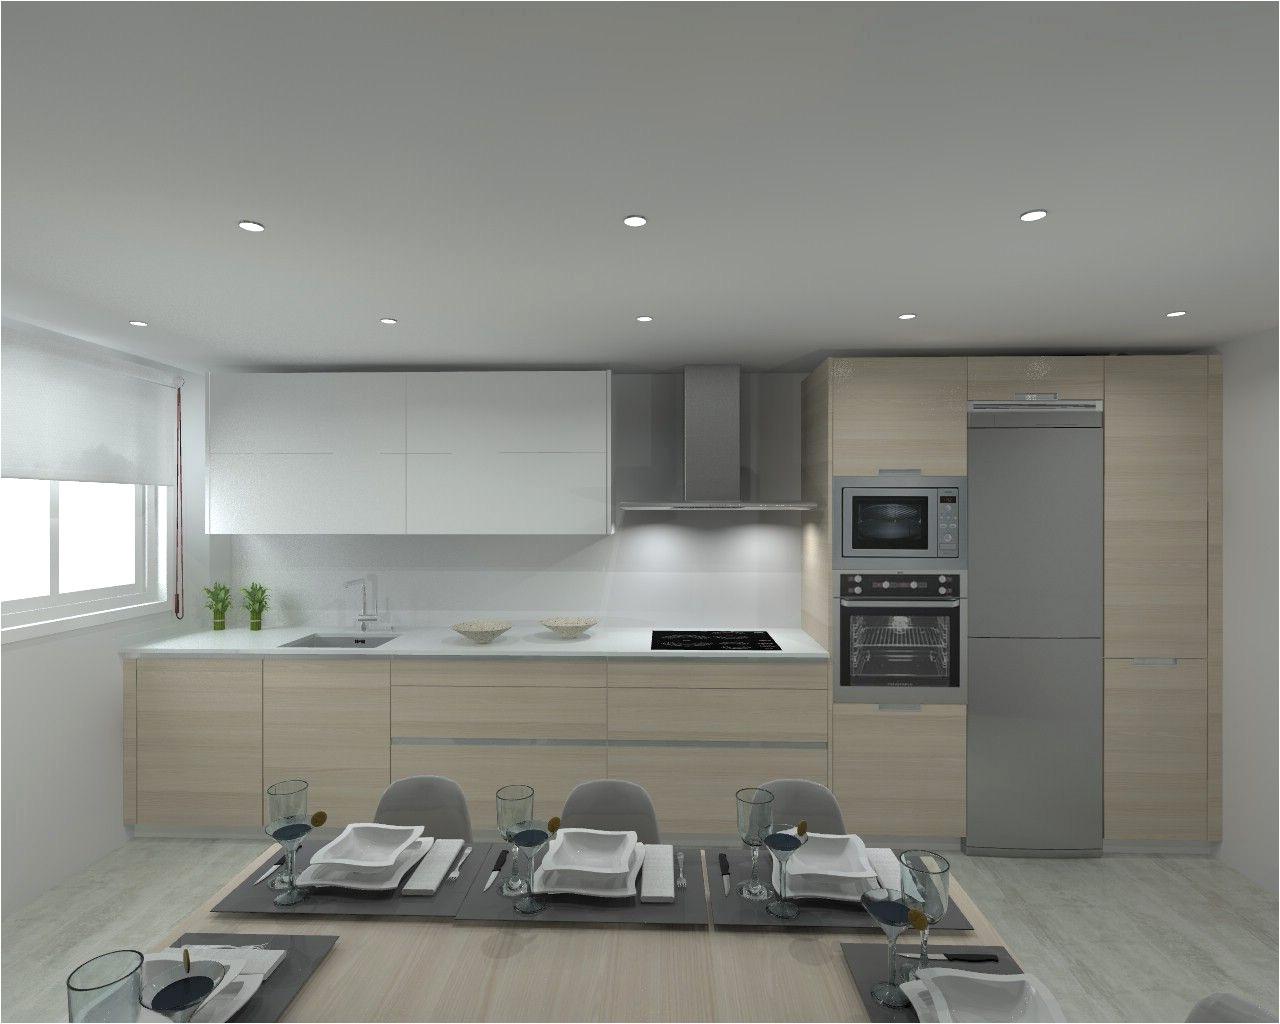 free lo mejor fotos de modelos cocinas modernas house ideas with modelos de cosinas